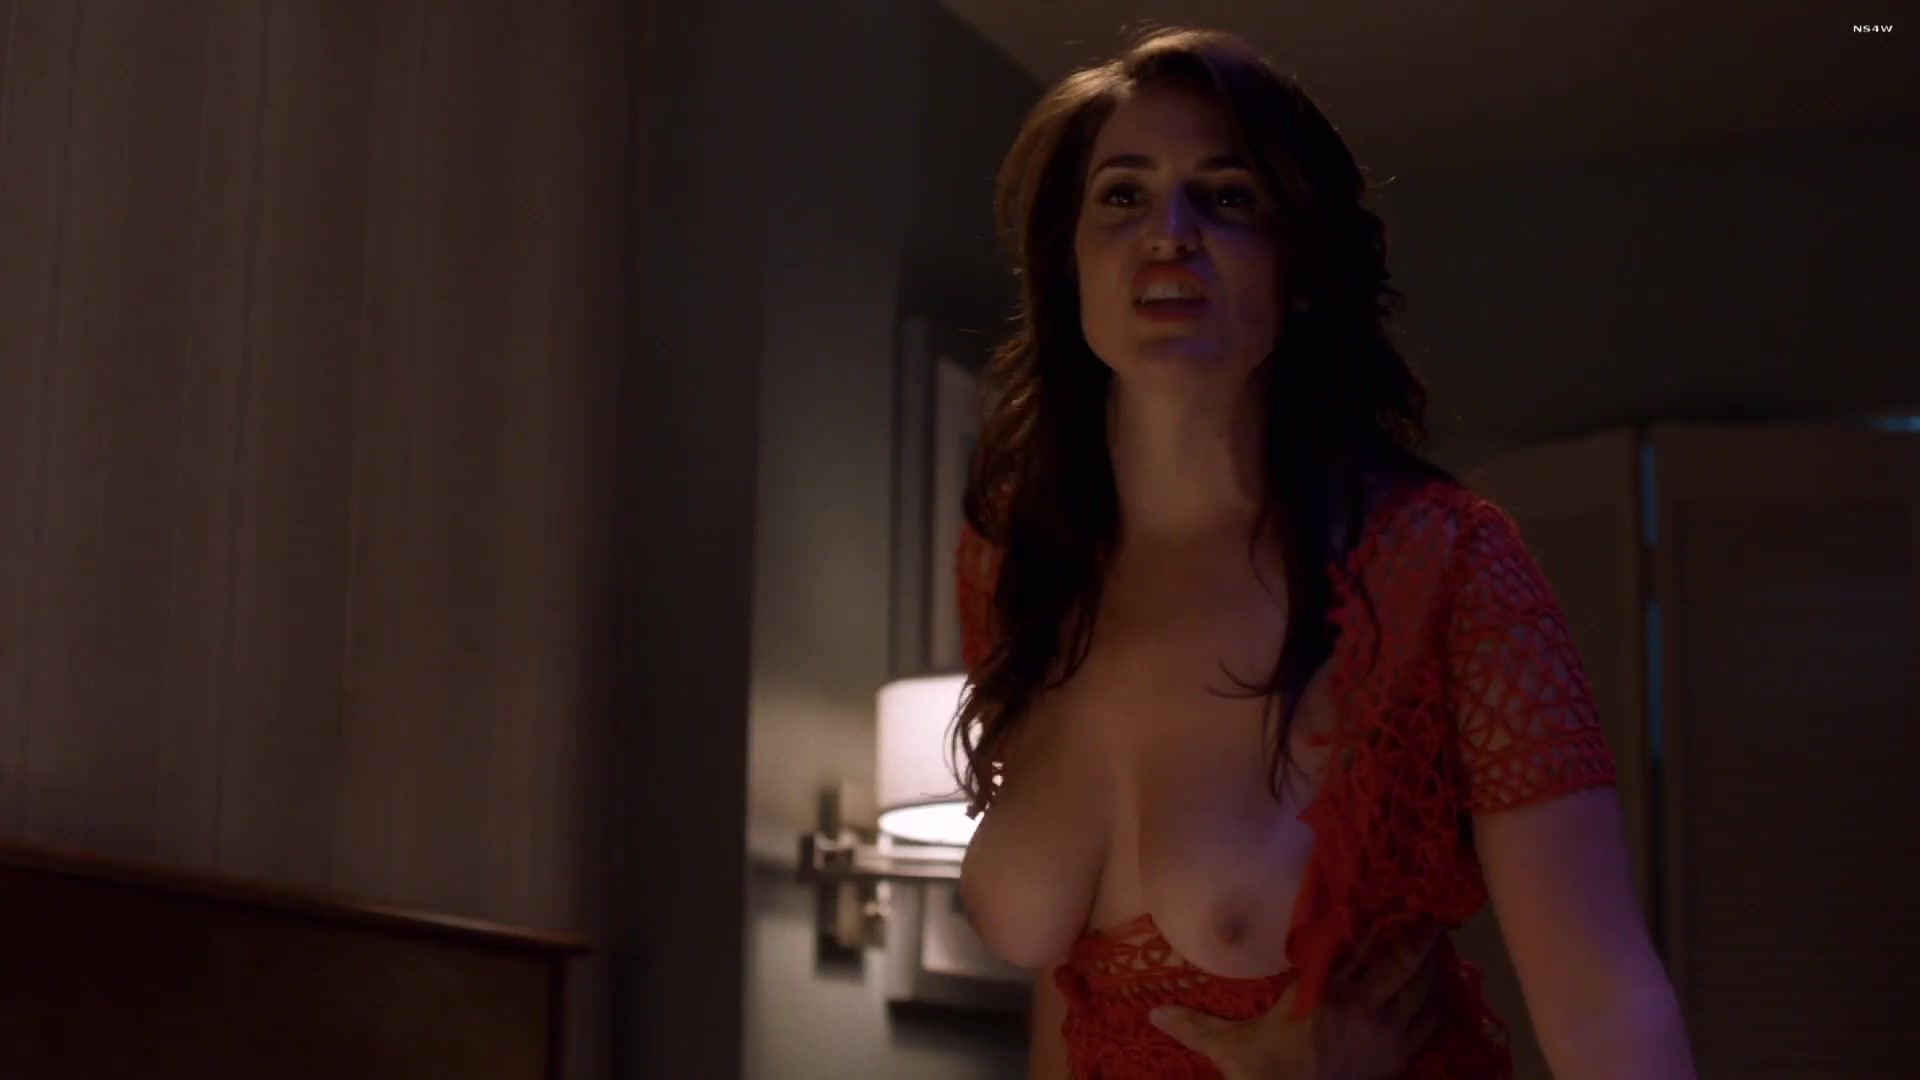 American Pie Actress Porn Video davie-blue - room 104 s01 e02 (2017) video » best sexy scene